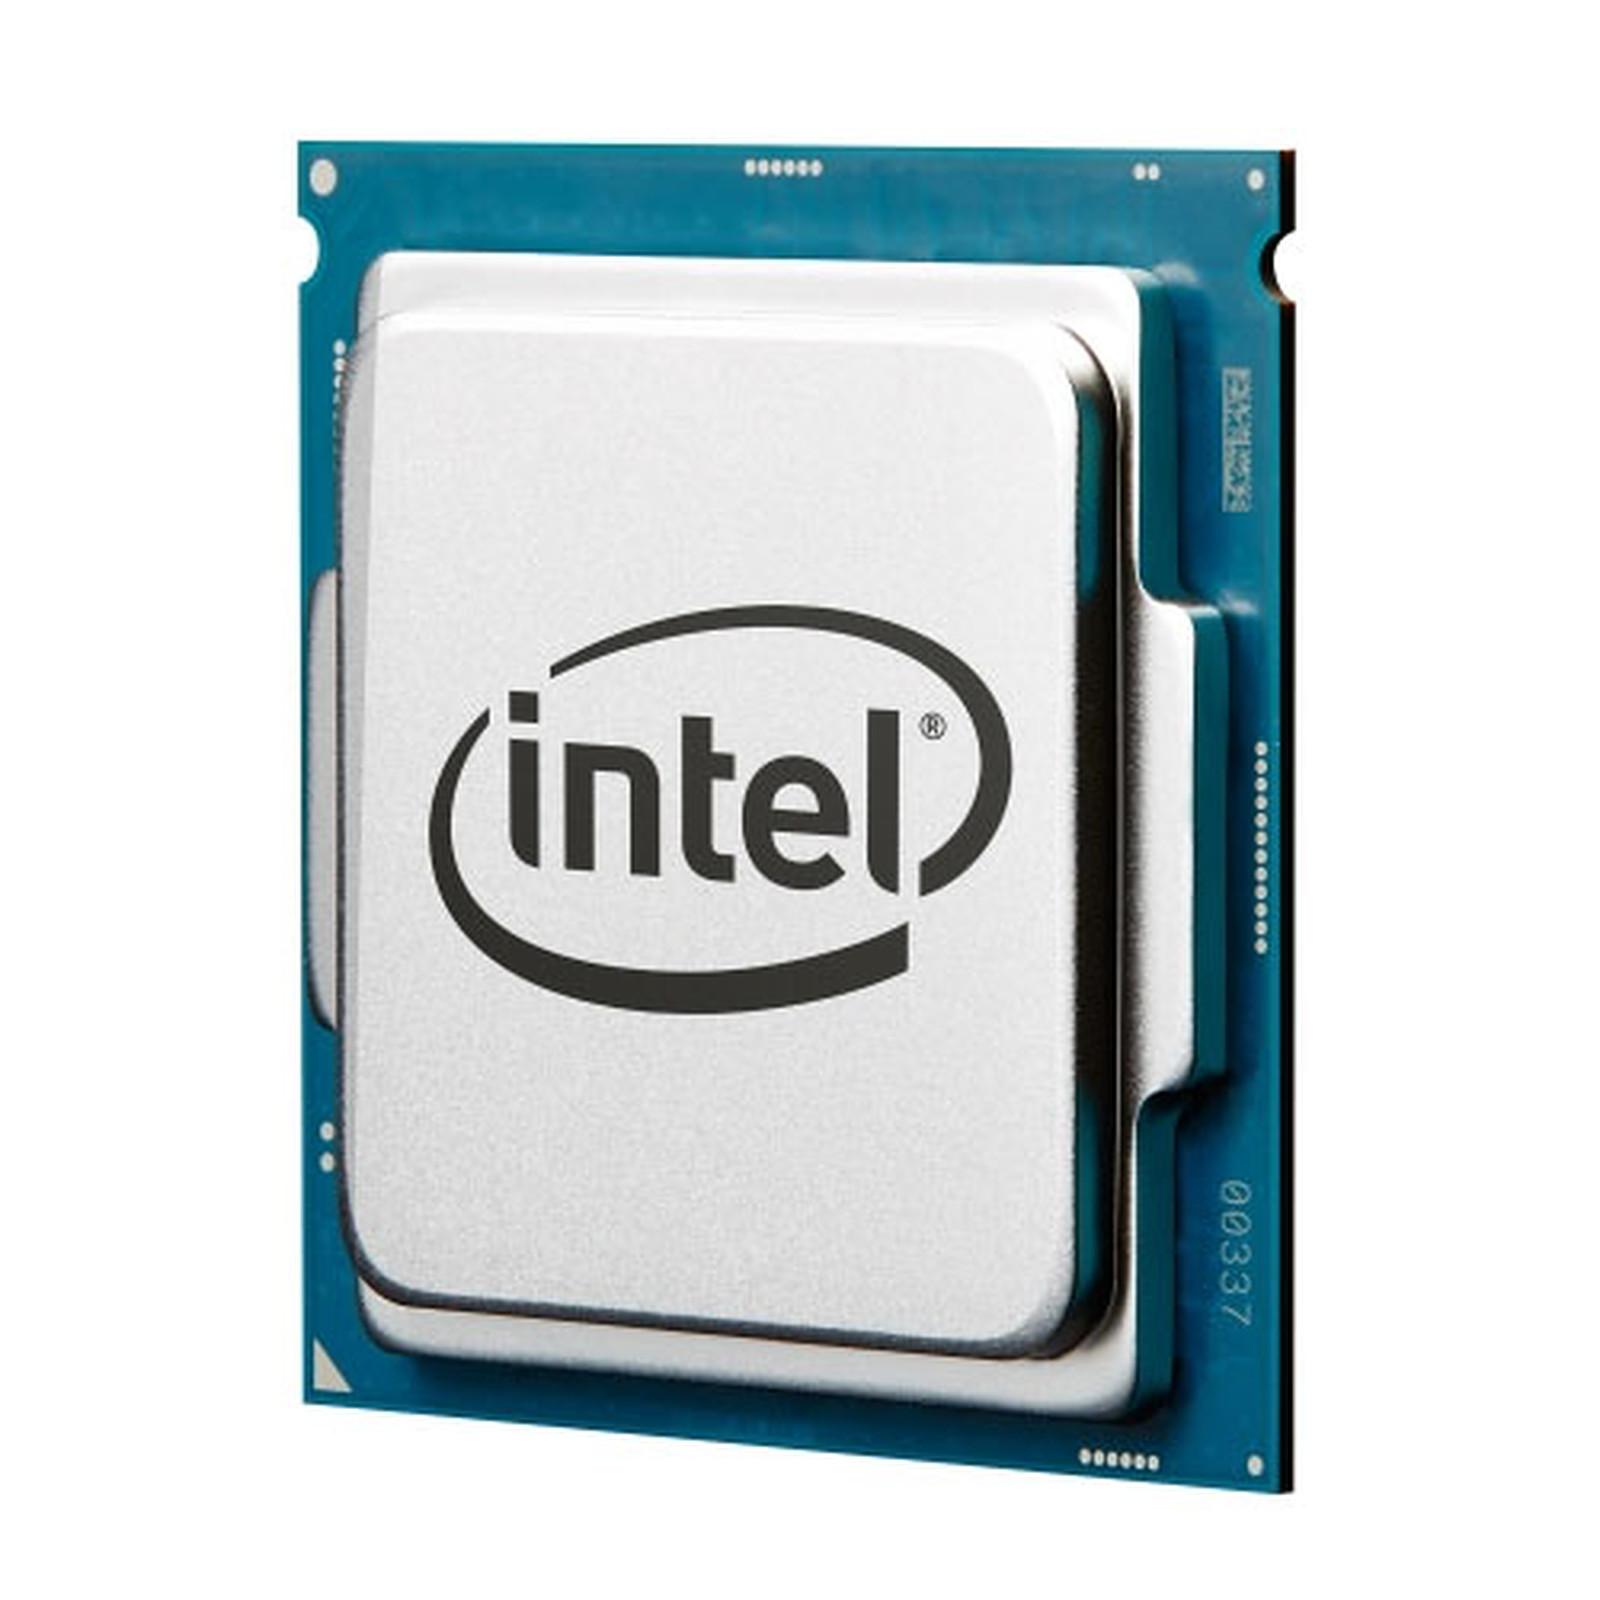 Intel Core I3-2370M (2.4 GHz)